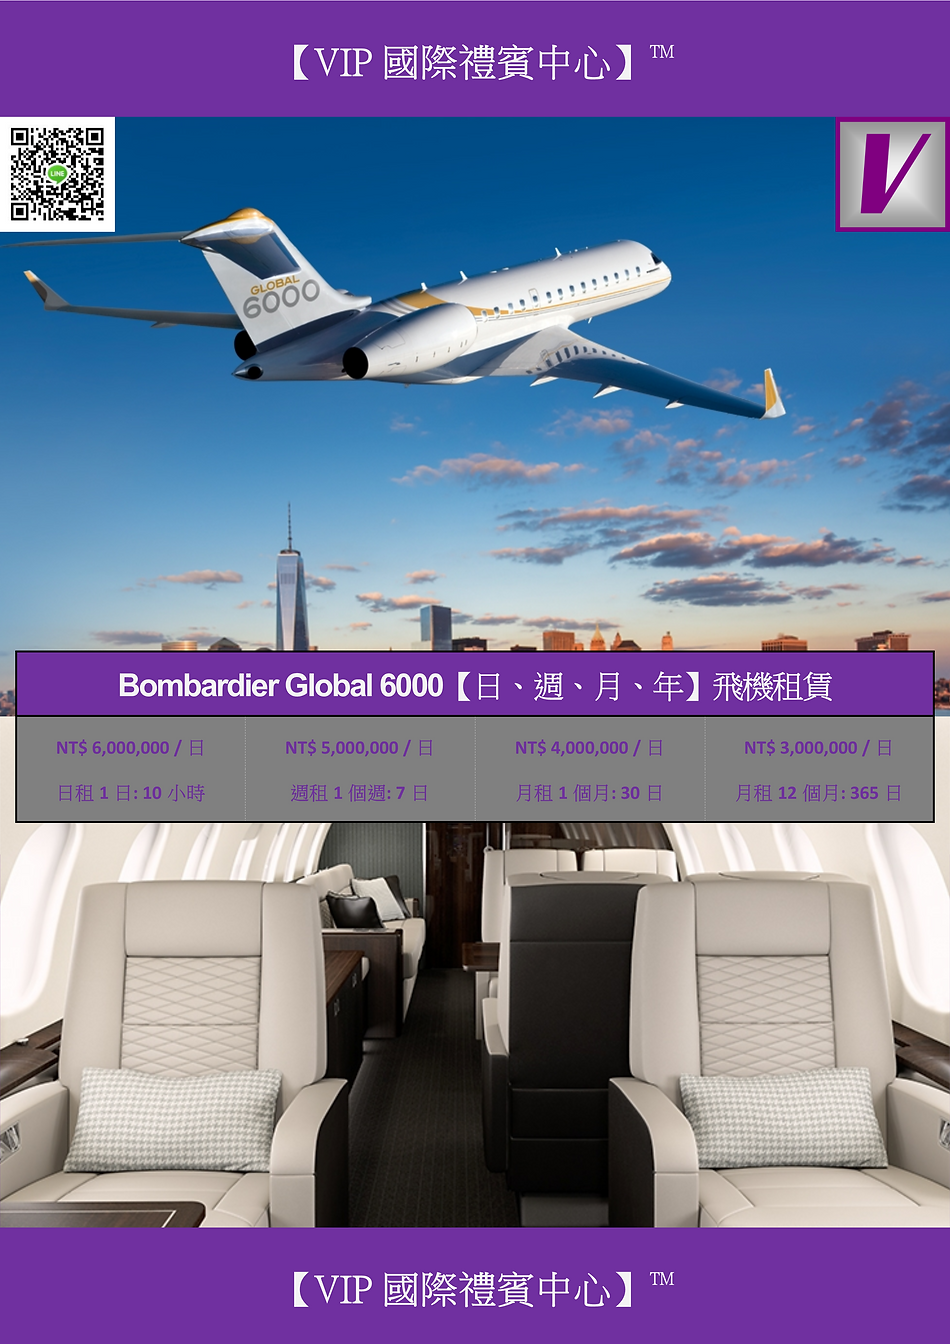 VIP國際禮賓中心 BOMBARDIER GLOBAL 6000 DM.png